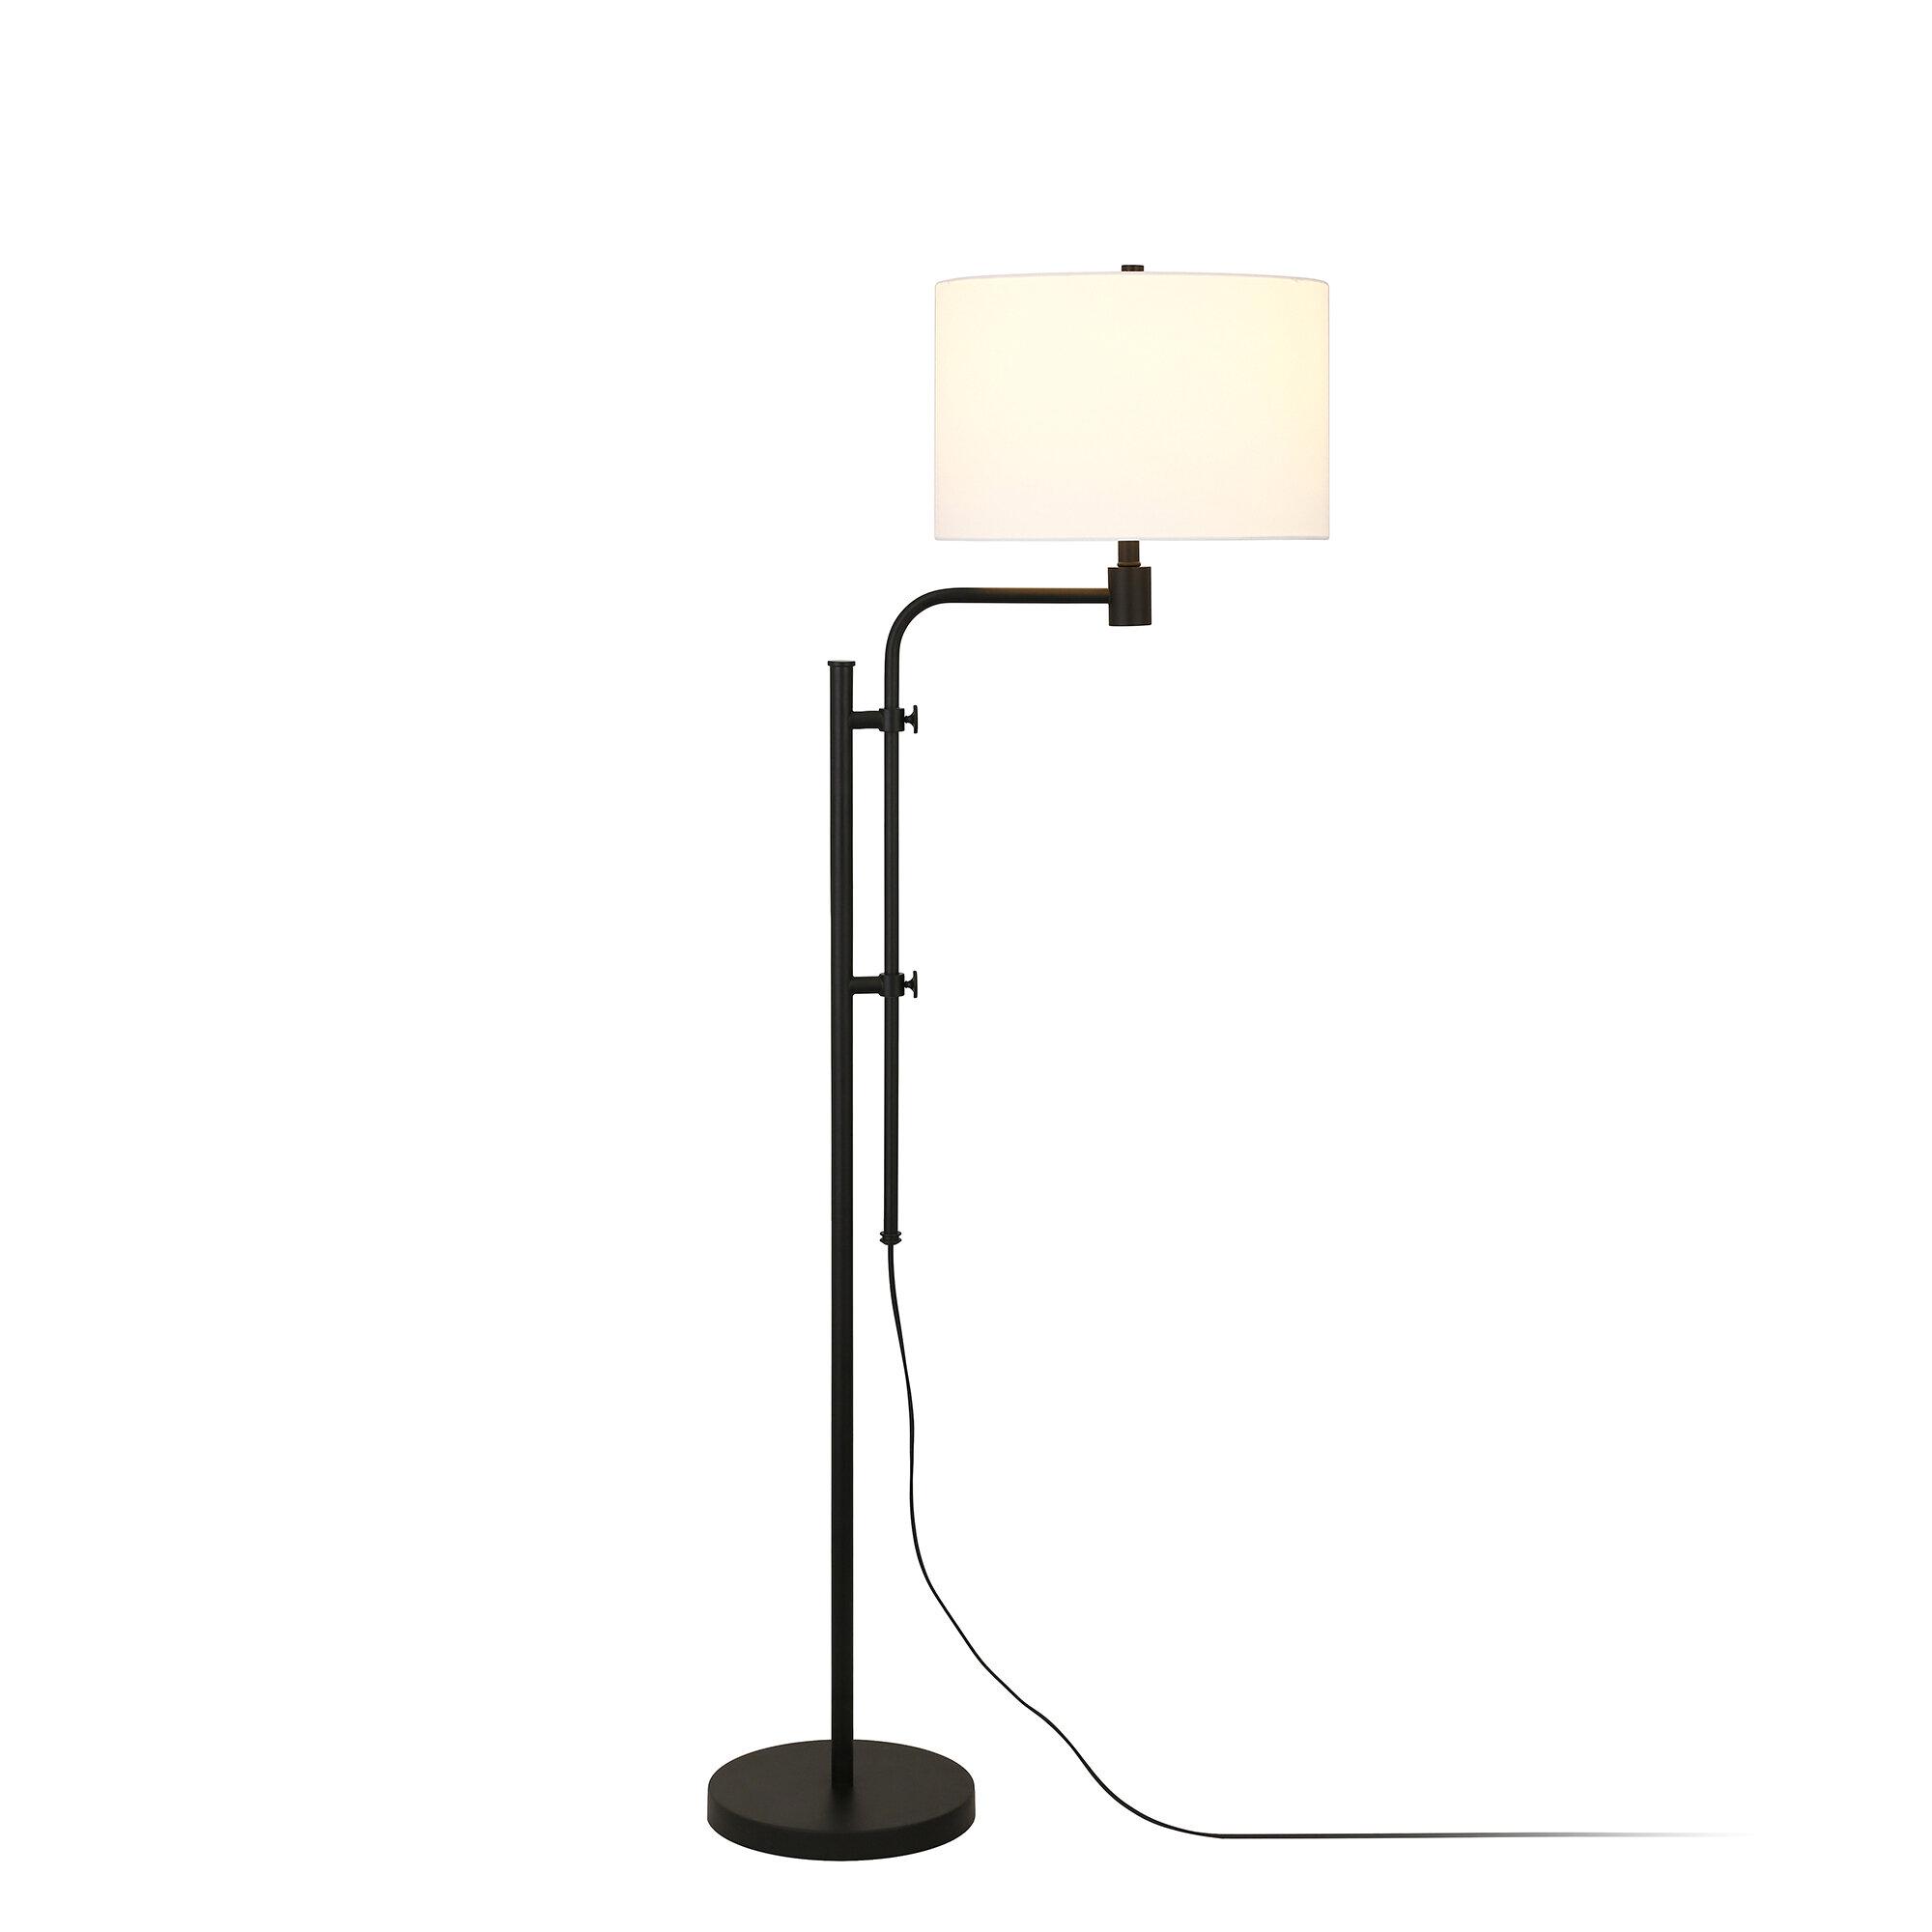 Swing Arm Floor Lamps Free Shipping Over 35 Wayfair